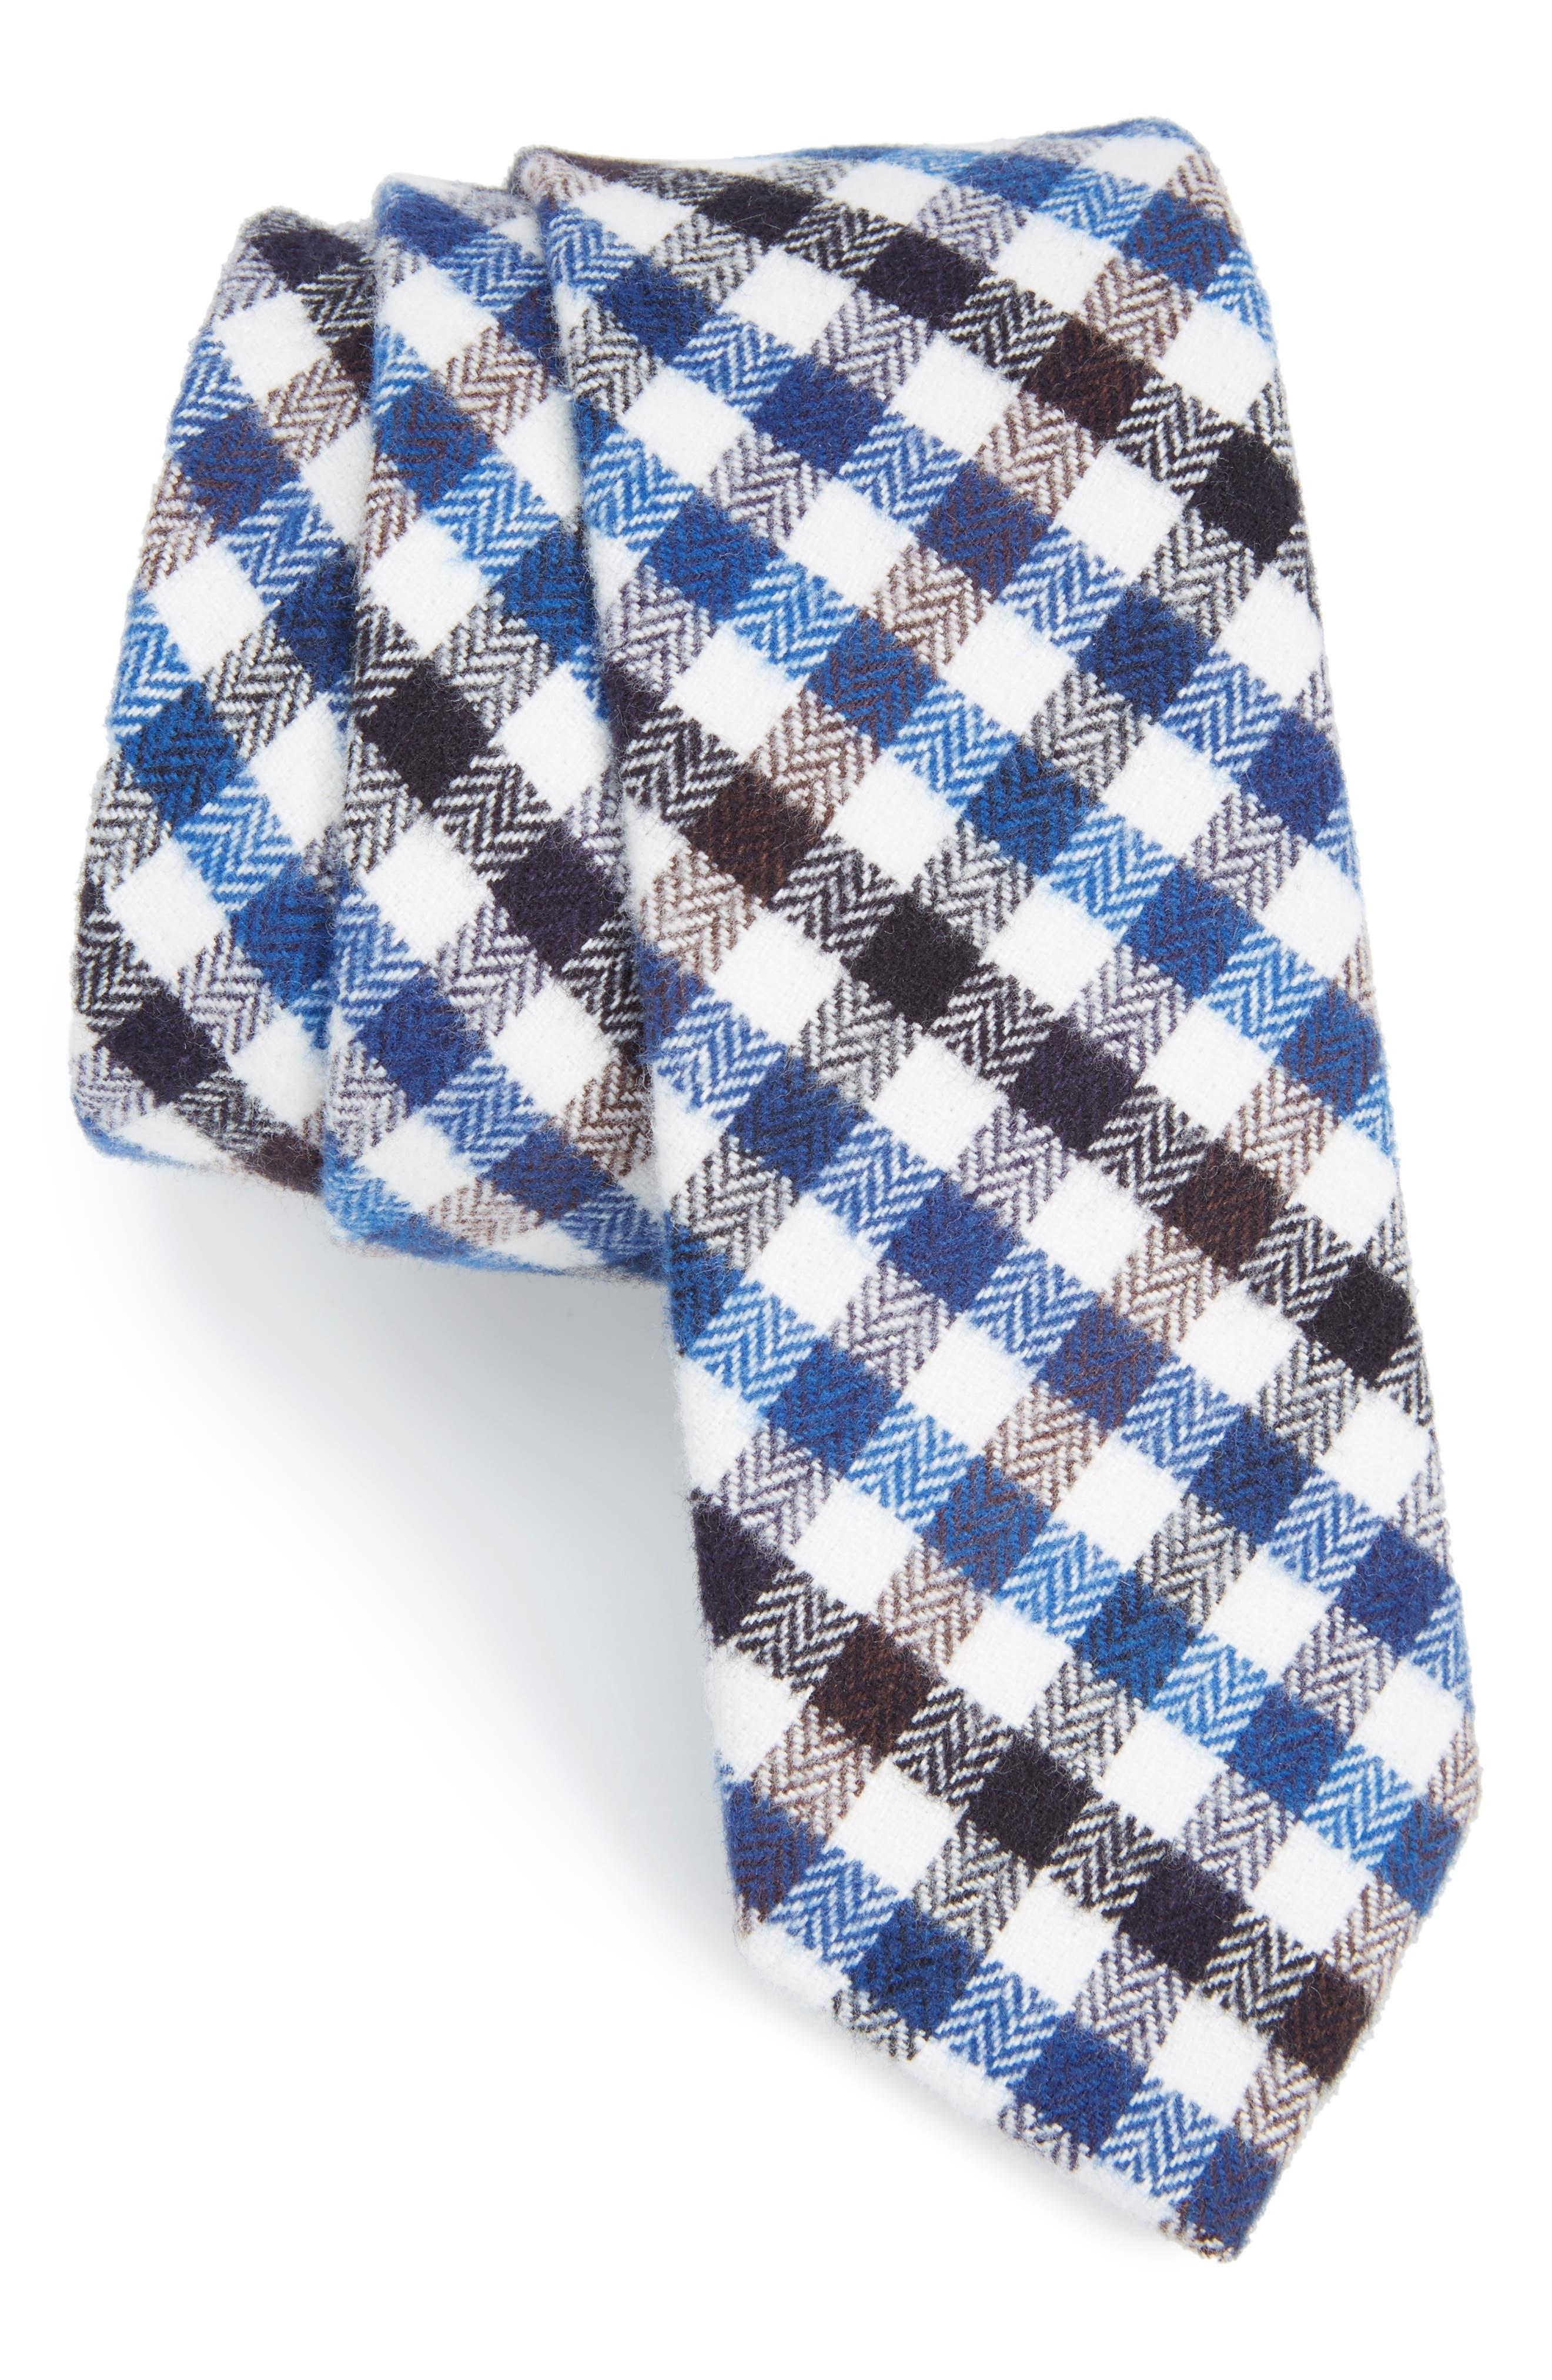 Nordstrom Men's Shop Gingham Cotton Skinny Tie